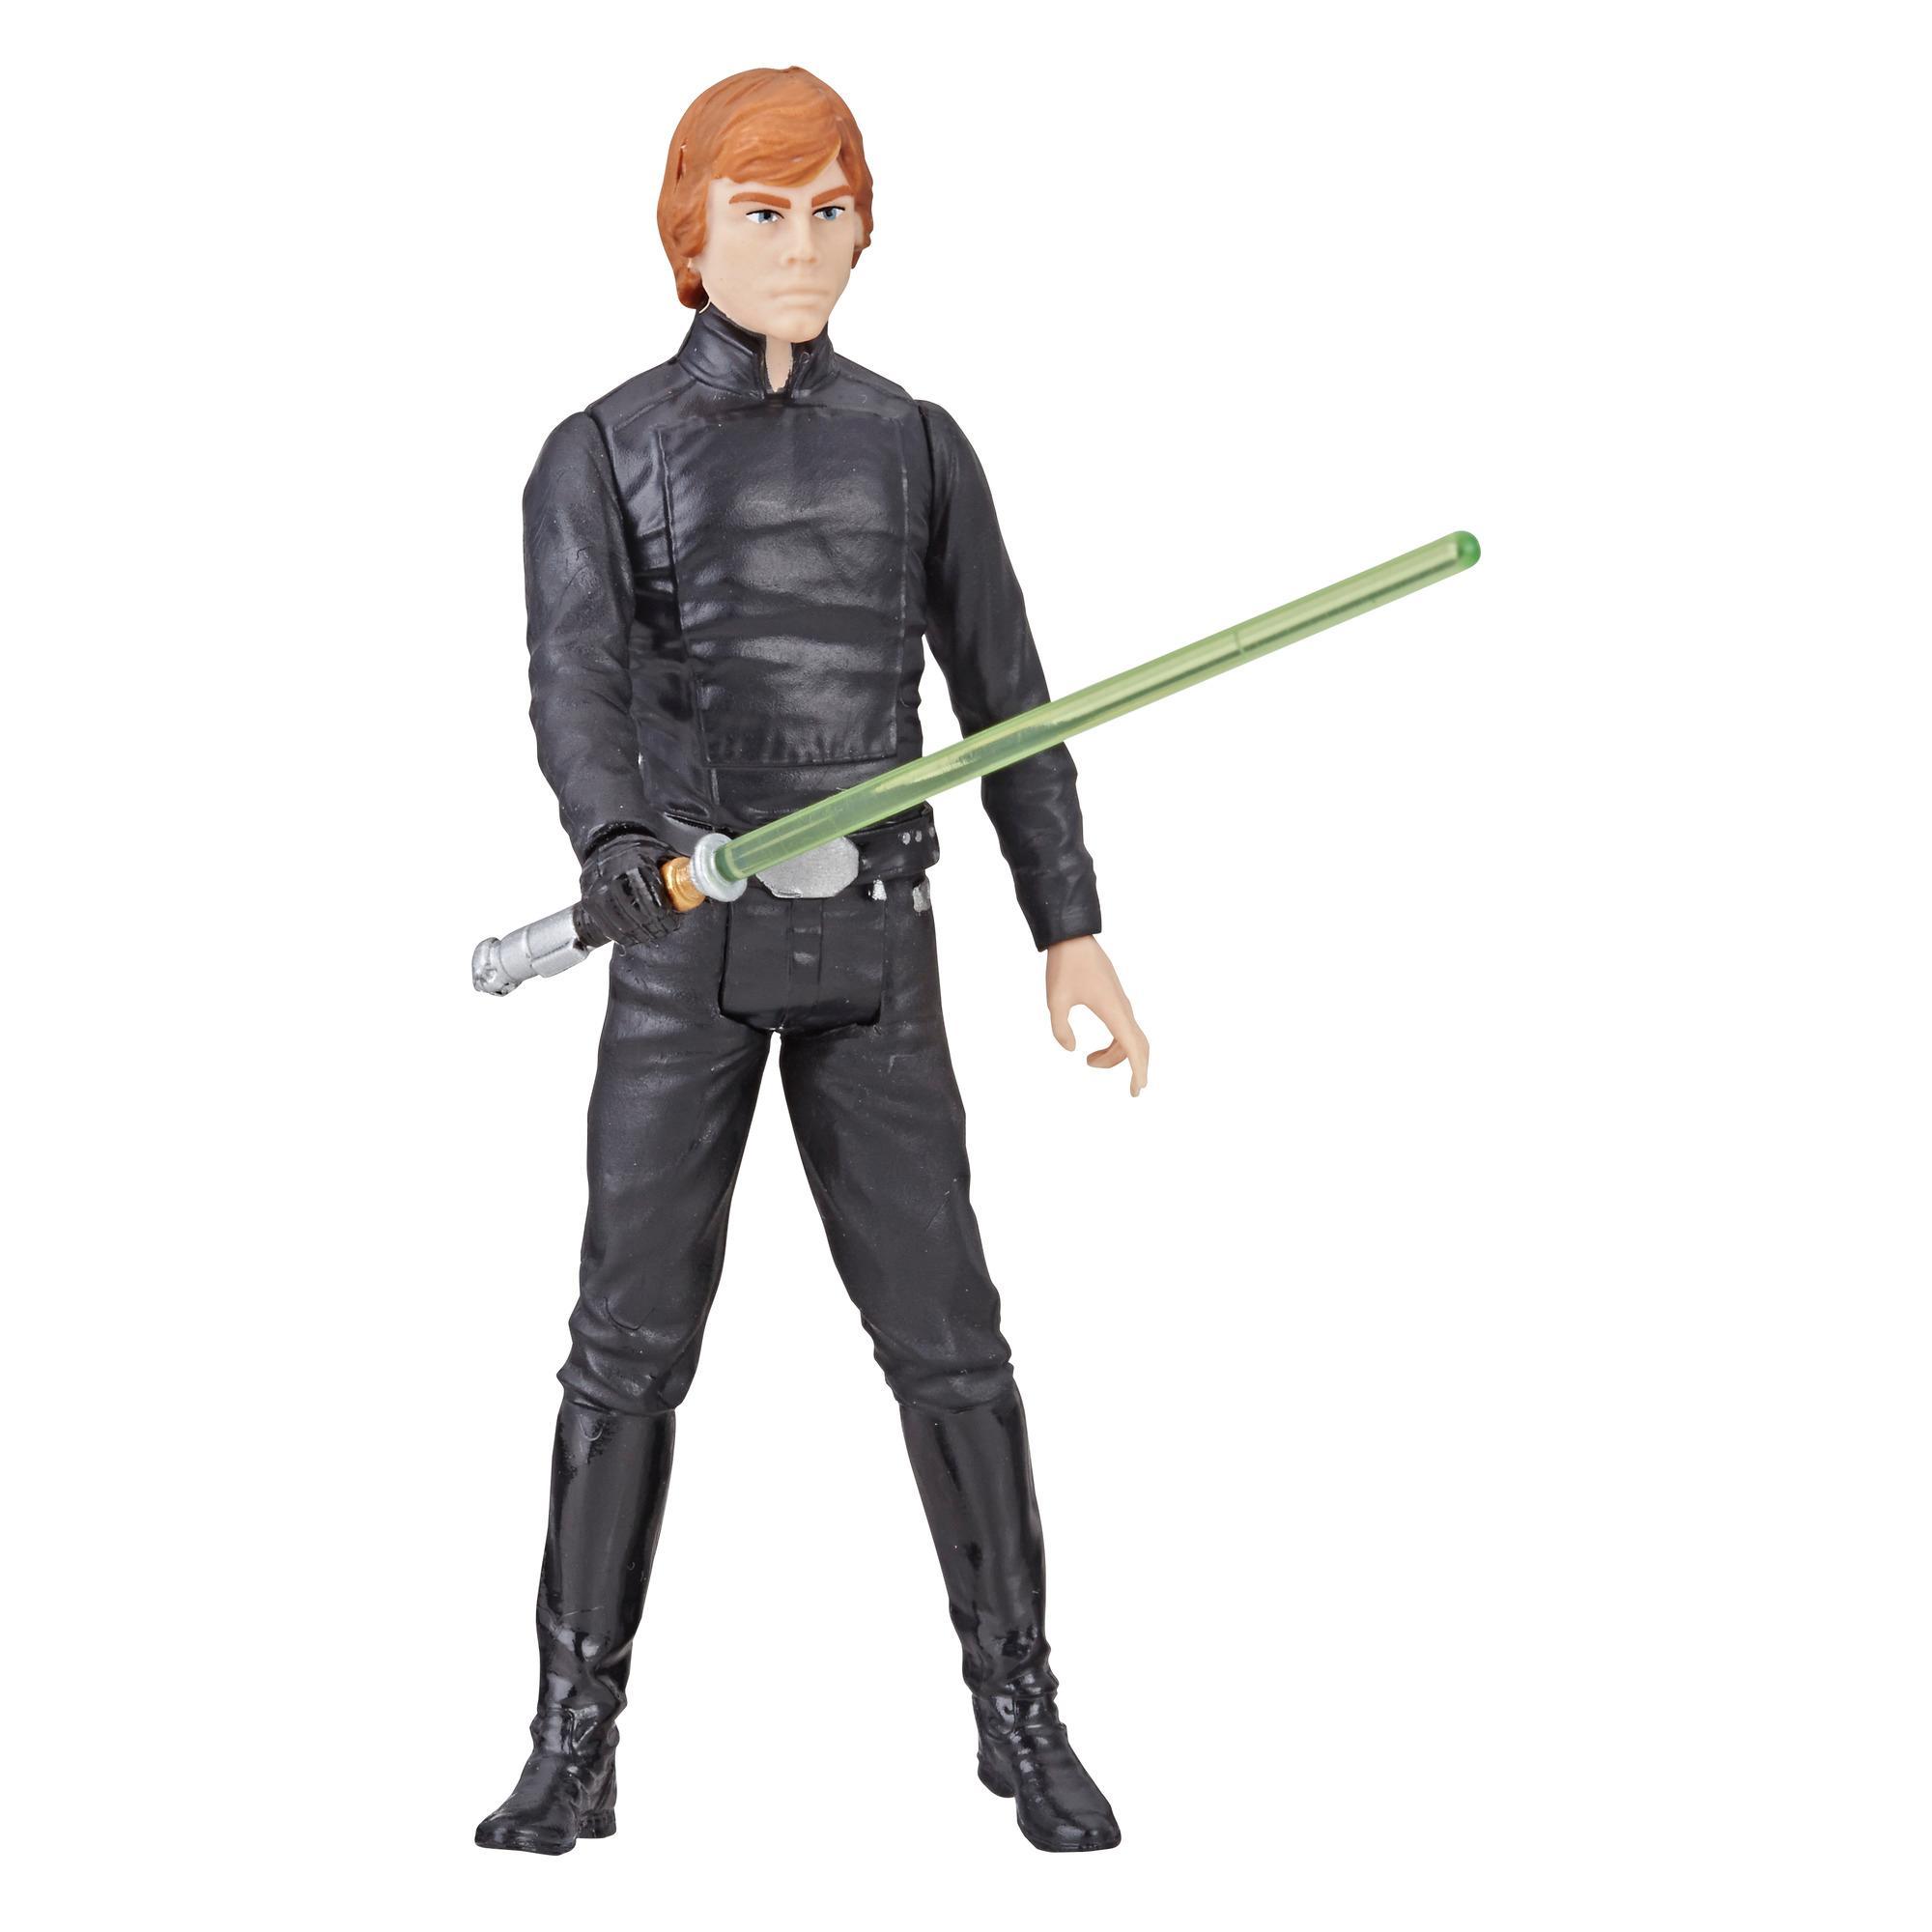 Star Wars Galaxy of Adventures Luke Skywalker Figur